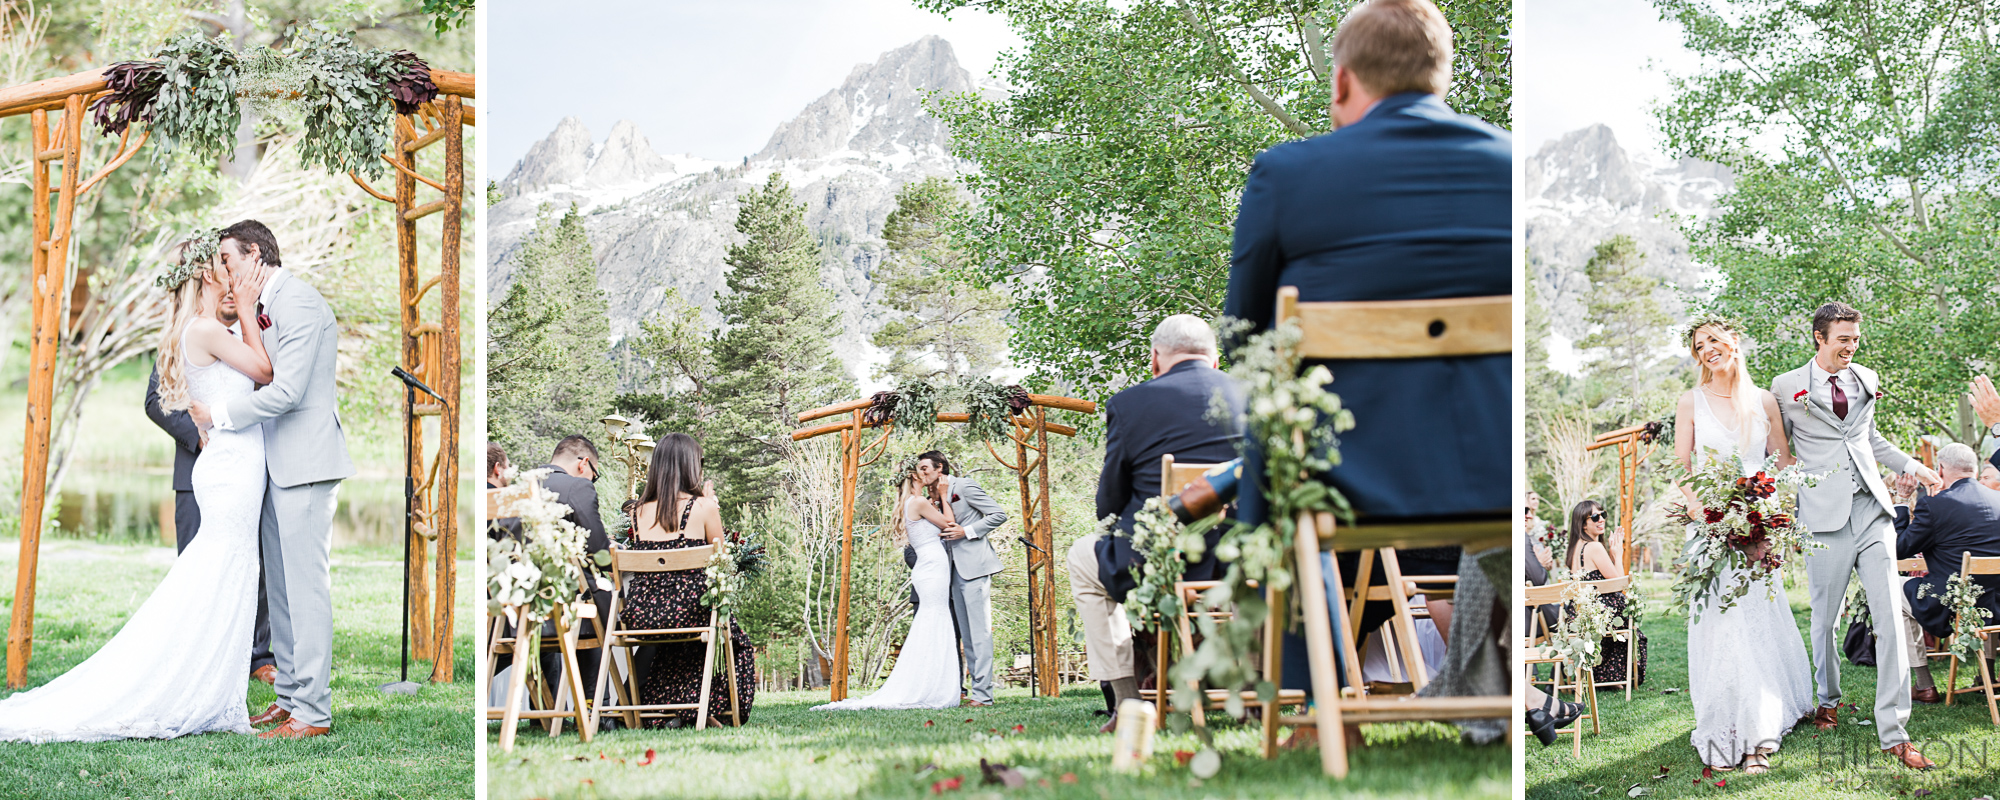 Double-Eagle-June-Lake-Wedding-Ceremony.jpg